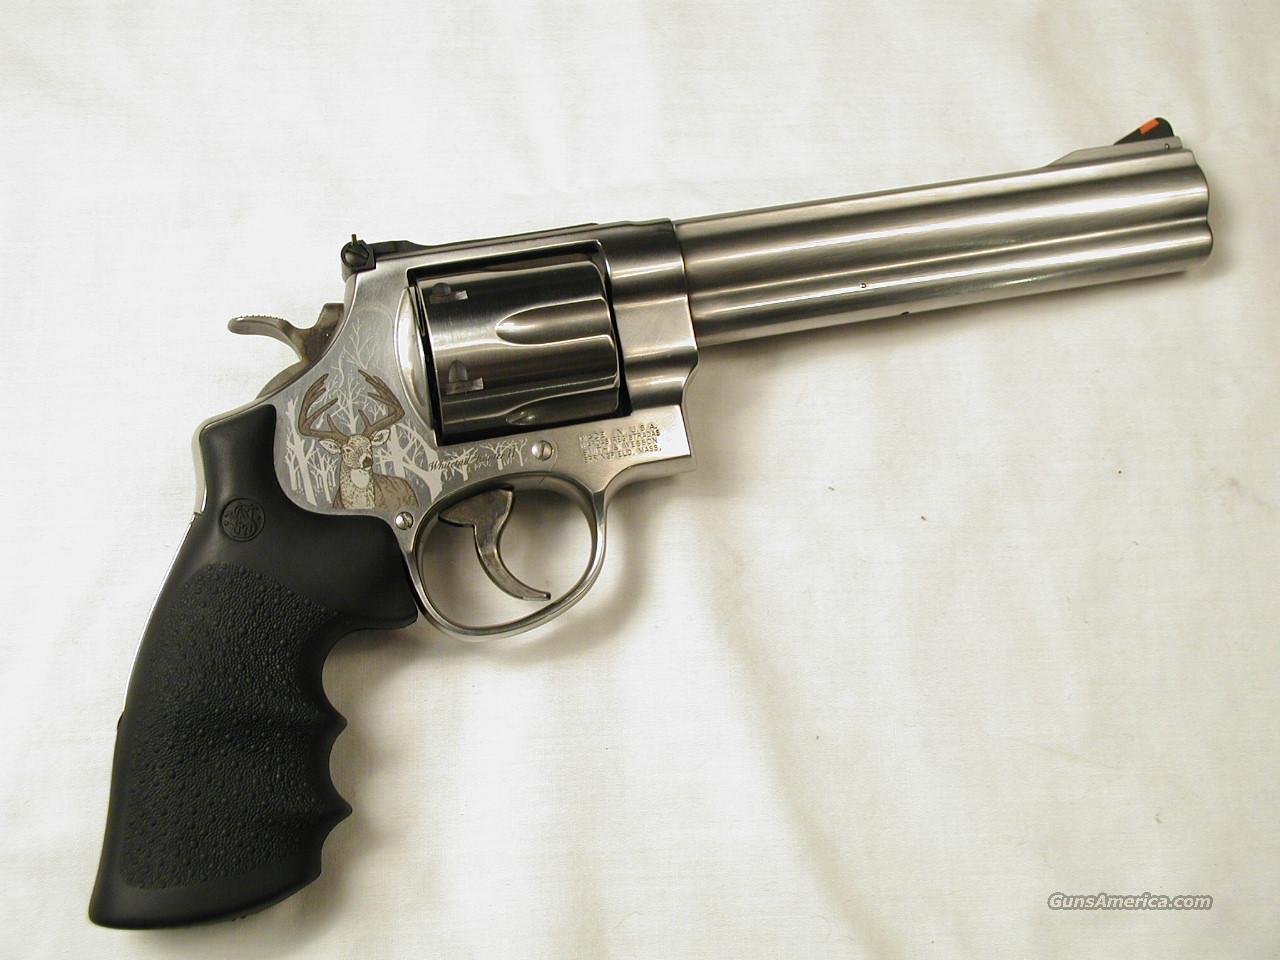 629 WHITETAIL HUNTER II  Guns > Pistols > Smith & Wesson Revolvers > Full Frame Revolver